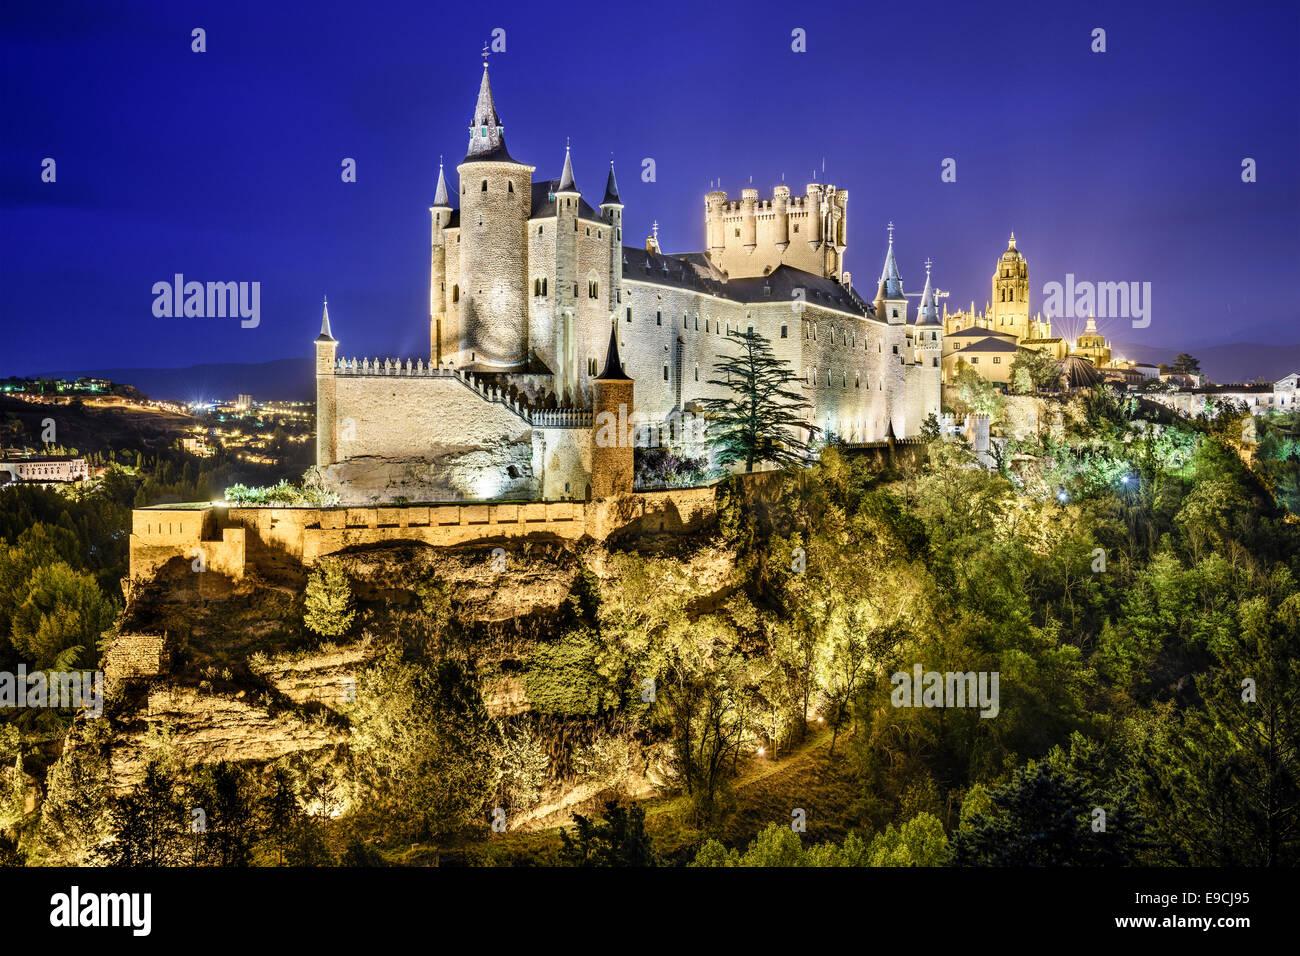 Segovia, Espagne ville skyline avec l'Alcazar de nuit. Photo Stock